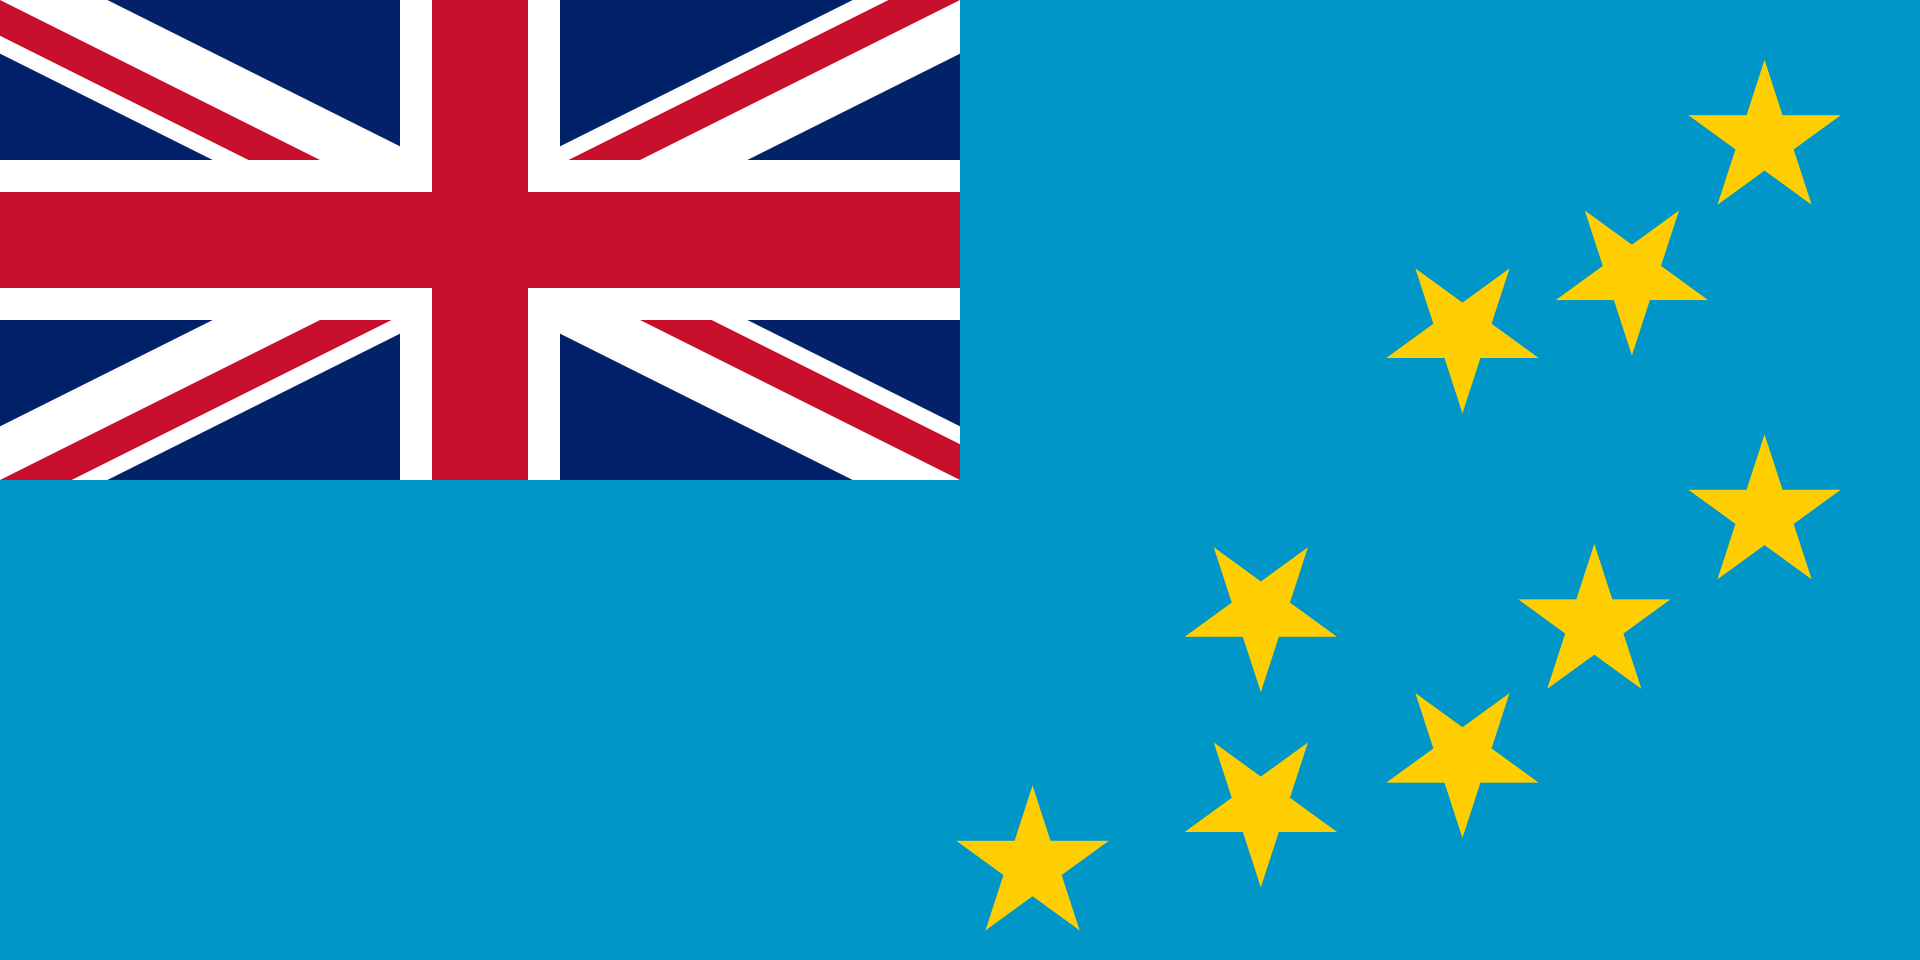 Flaga kraju TUVALU [PNG]